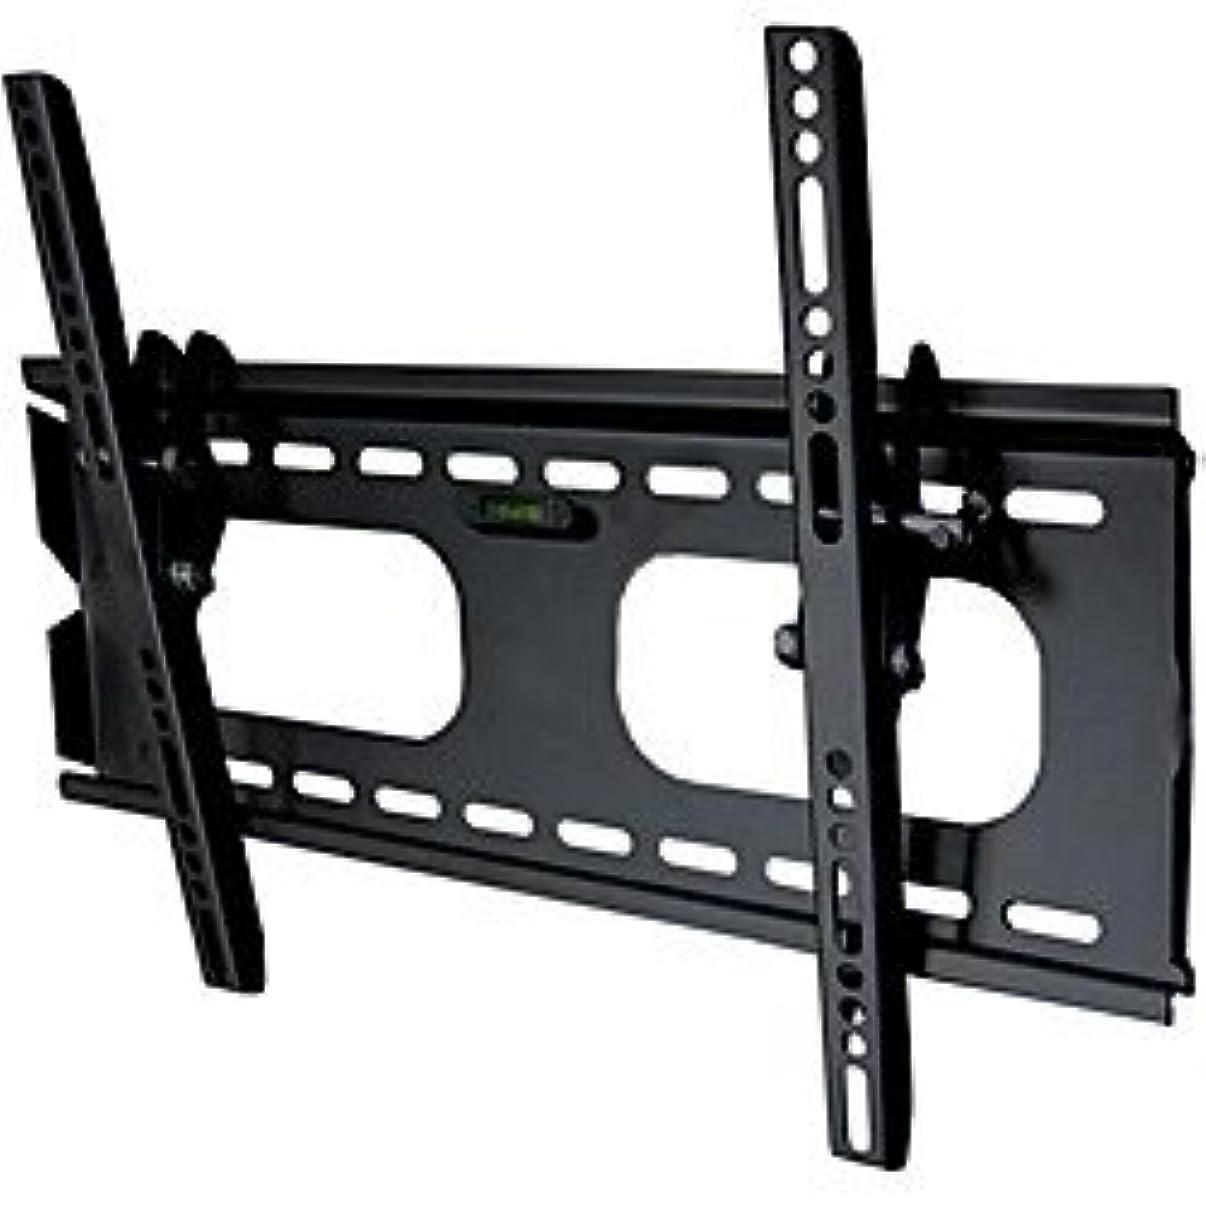 TILT TV WALL MOUNT BRACKET For Samsung 55